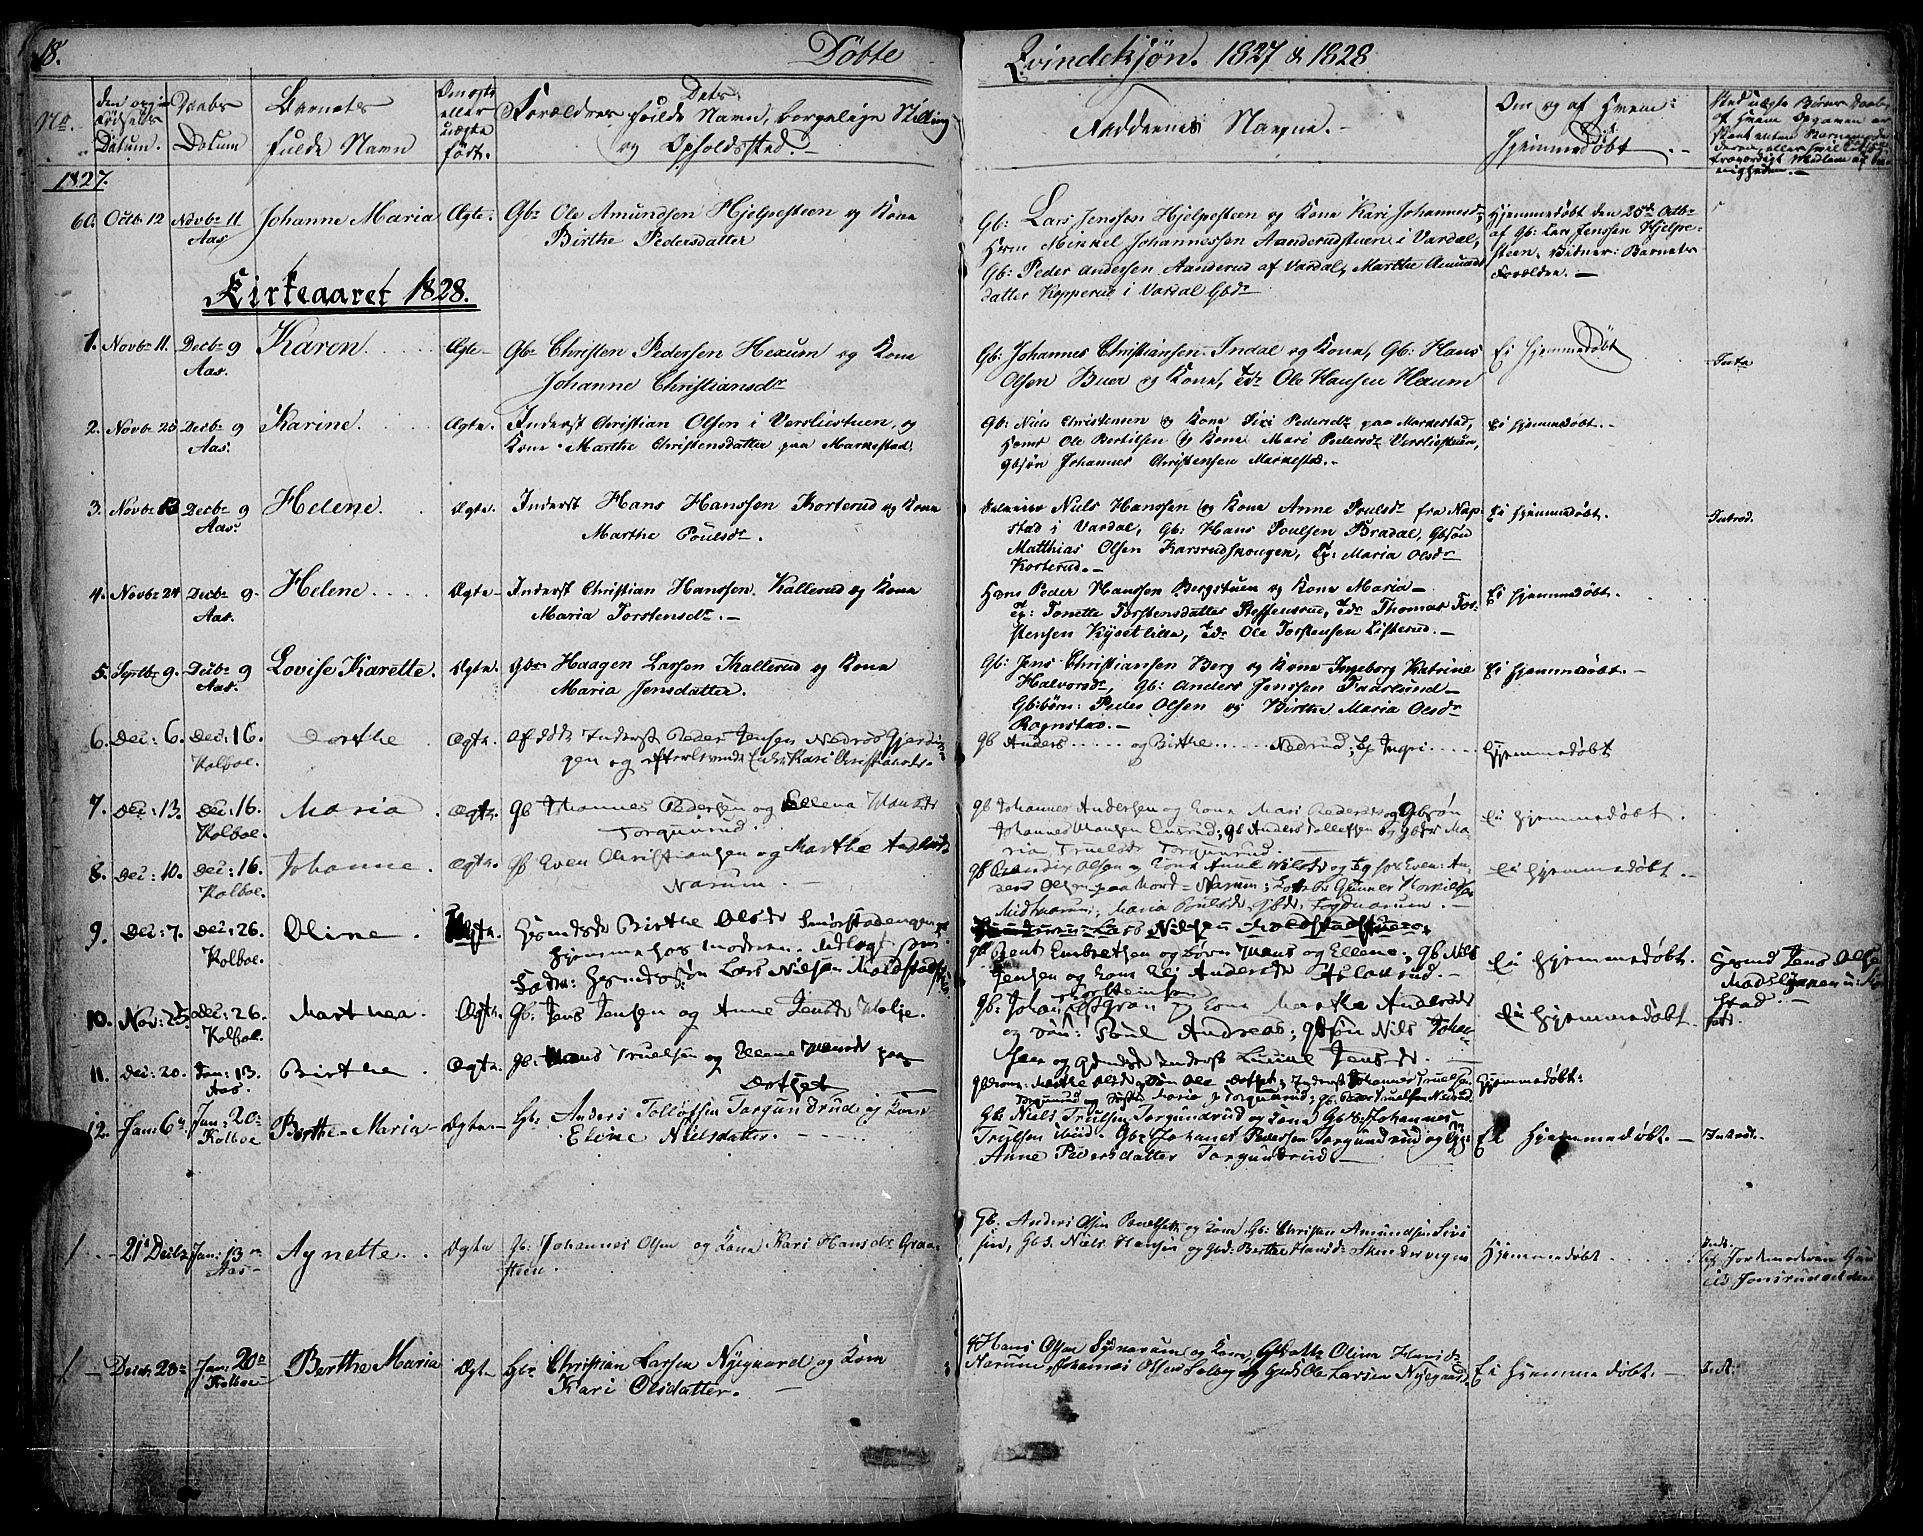 SAH, Vestre Toten prestekontor, H/Ha/Haa/L0002: Ministerialbok nr. 2, 1825-1837, s. 18